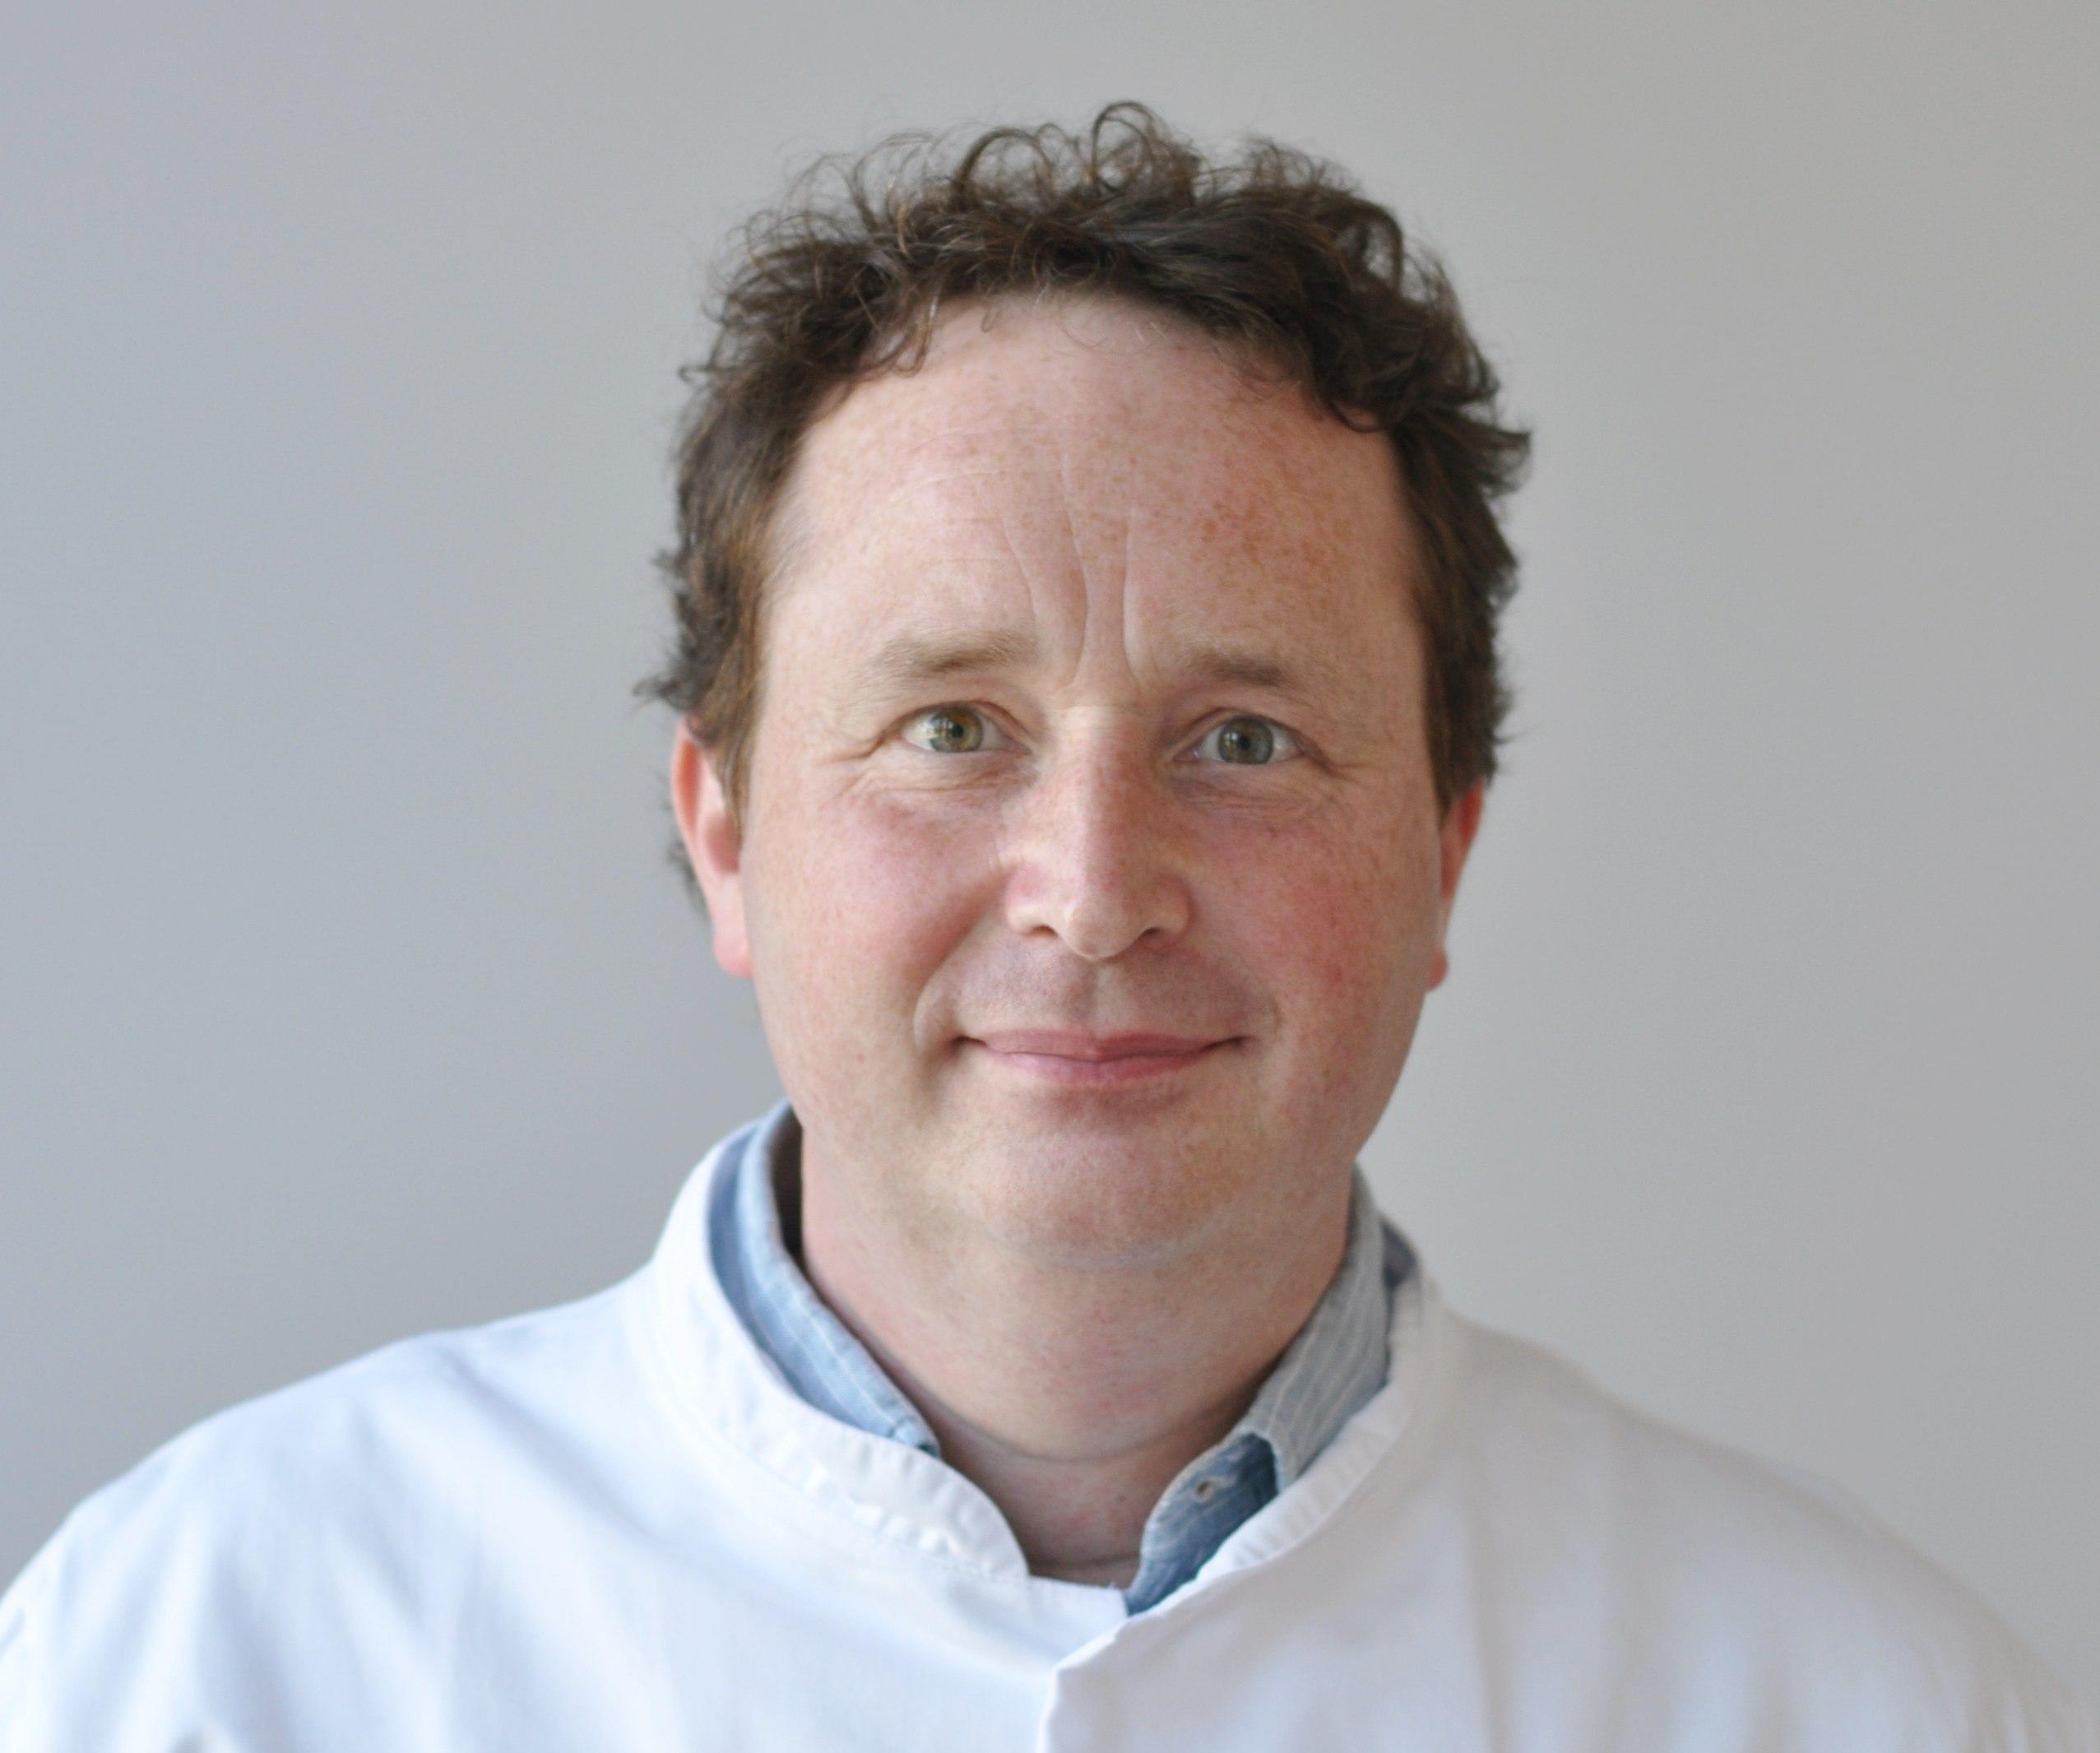 PD Dr. med. Gunnar Folprecht